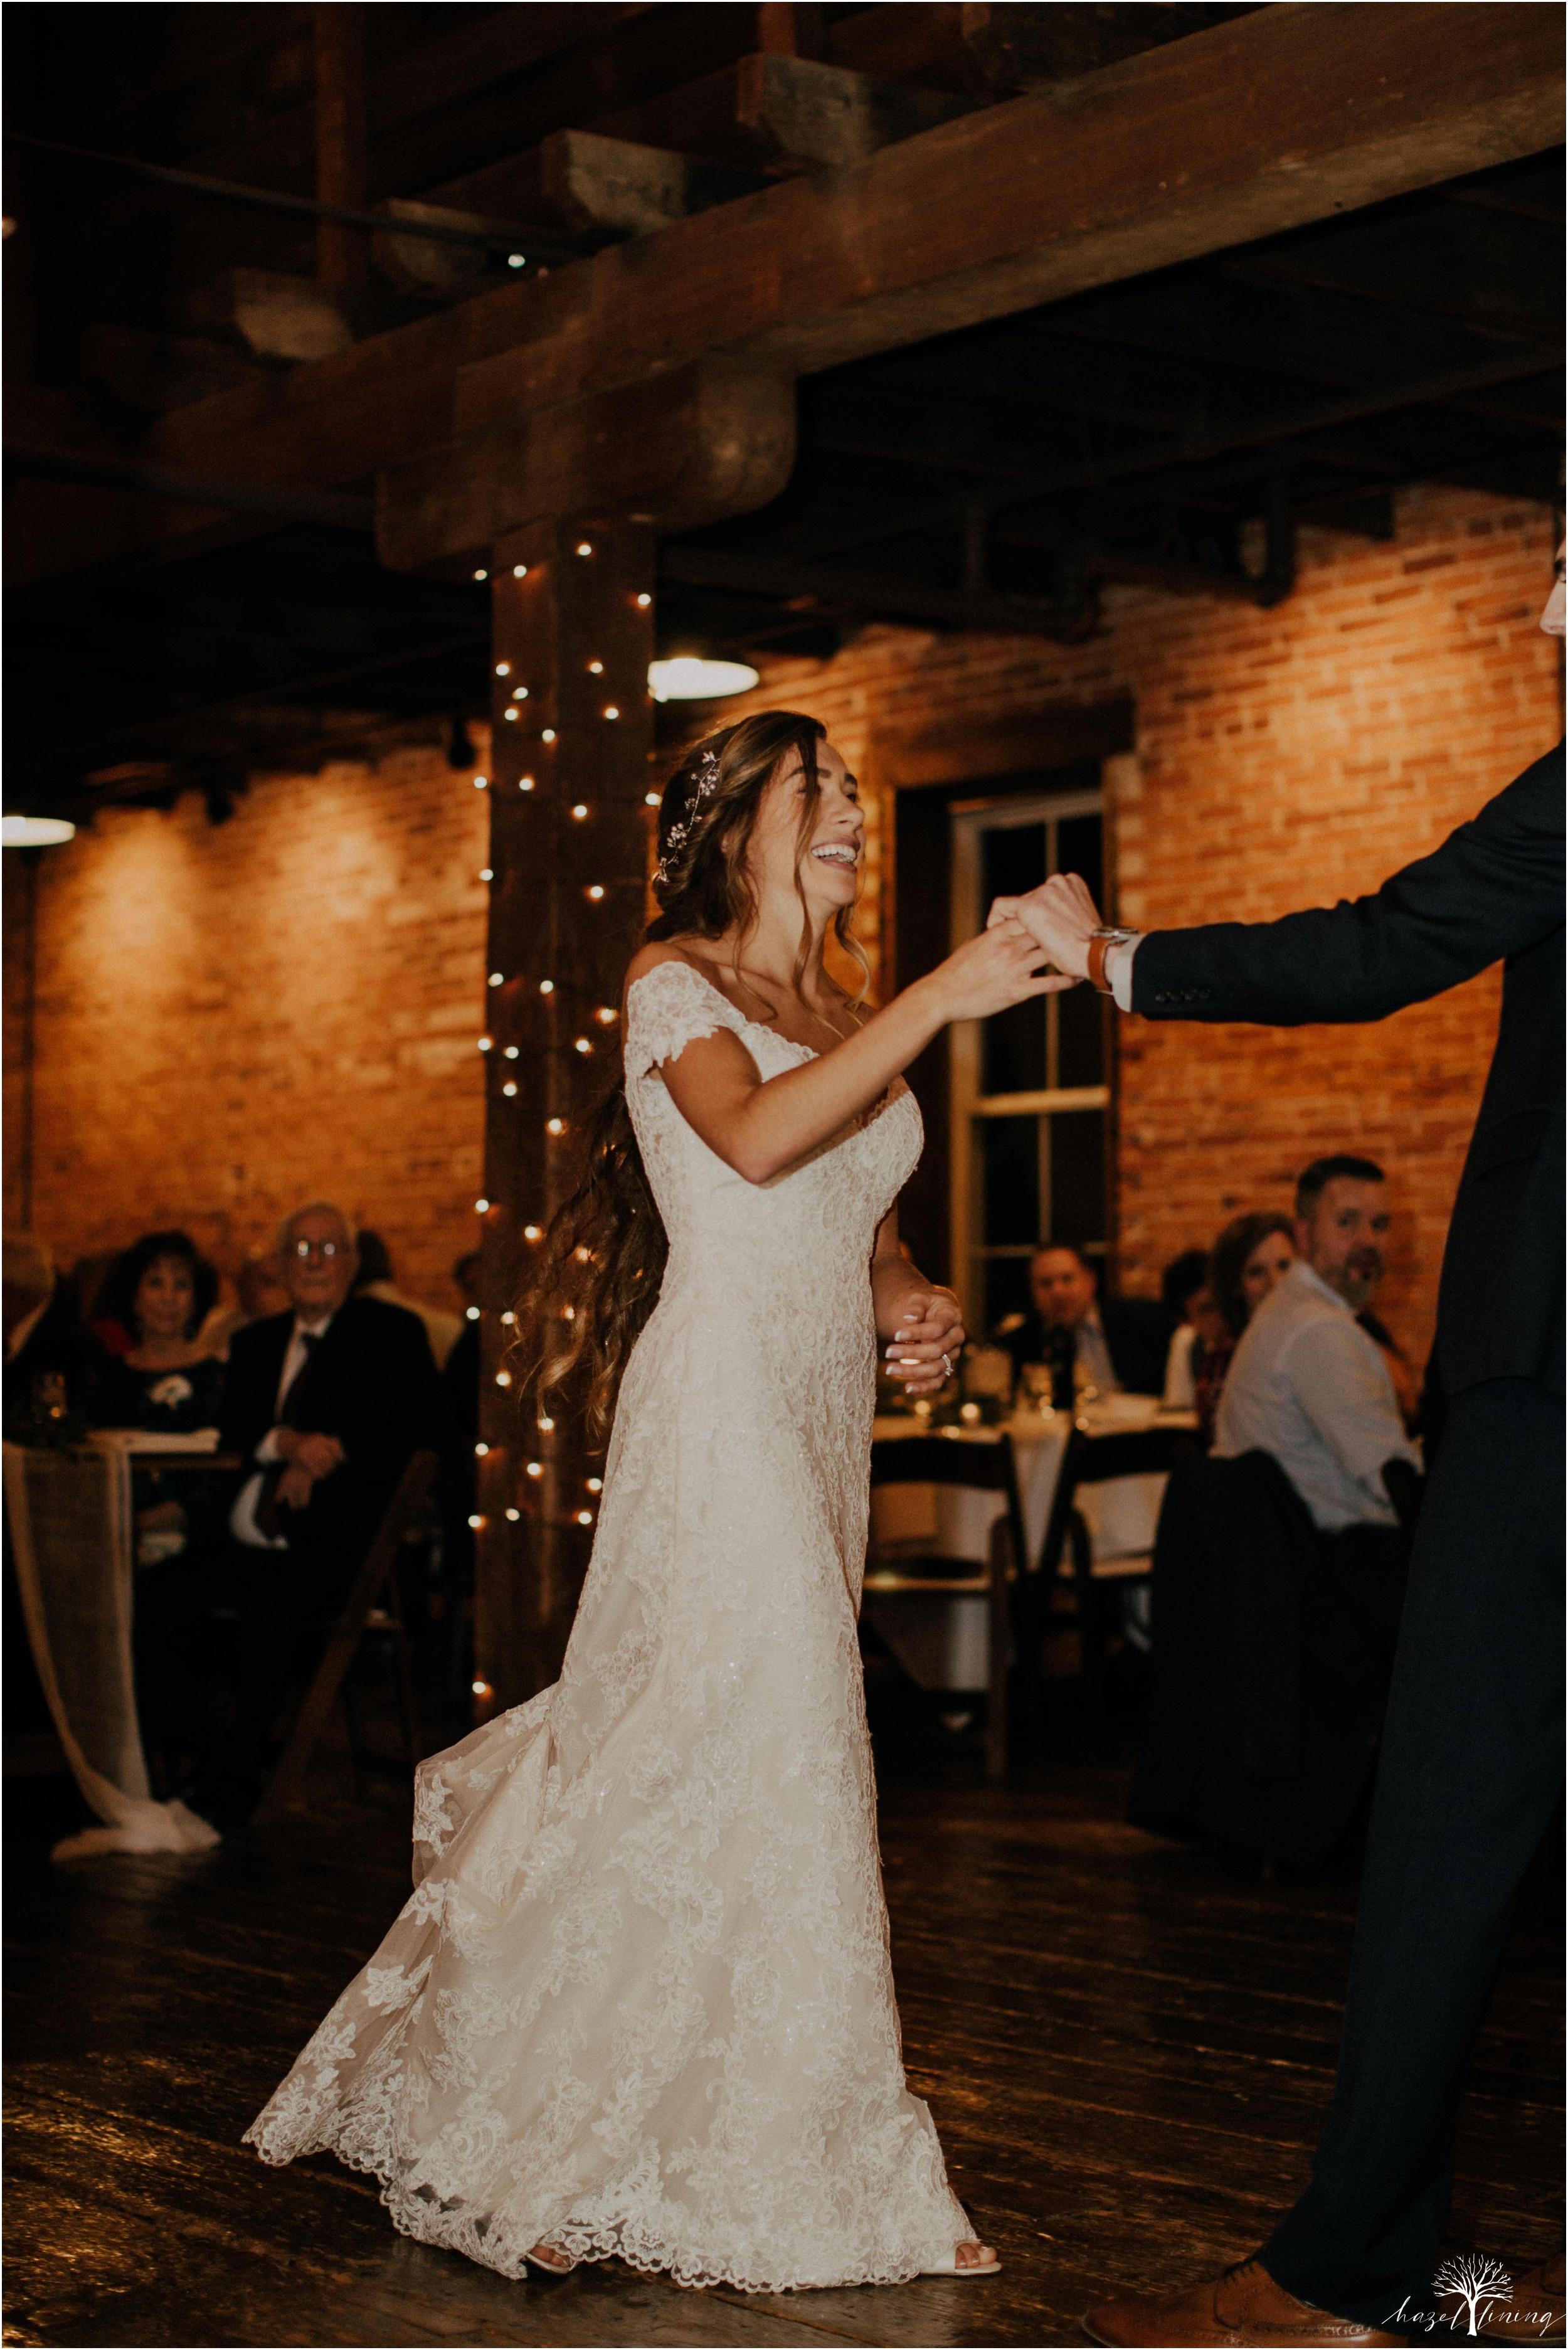 emma-matt-gehringer-the-booking-house-lancaster-manhiem-pennsylvania-winter-wedding_0144.jpg